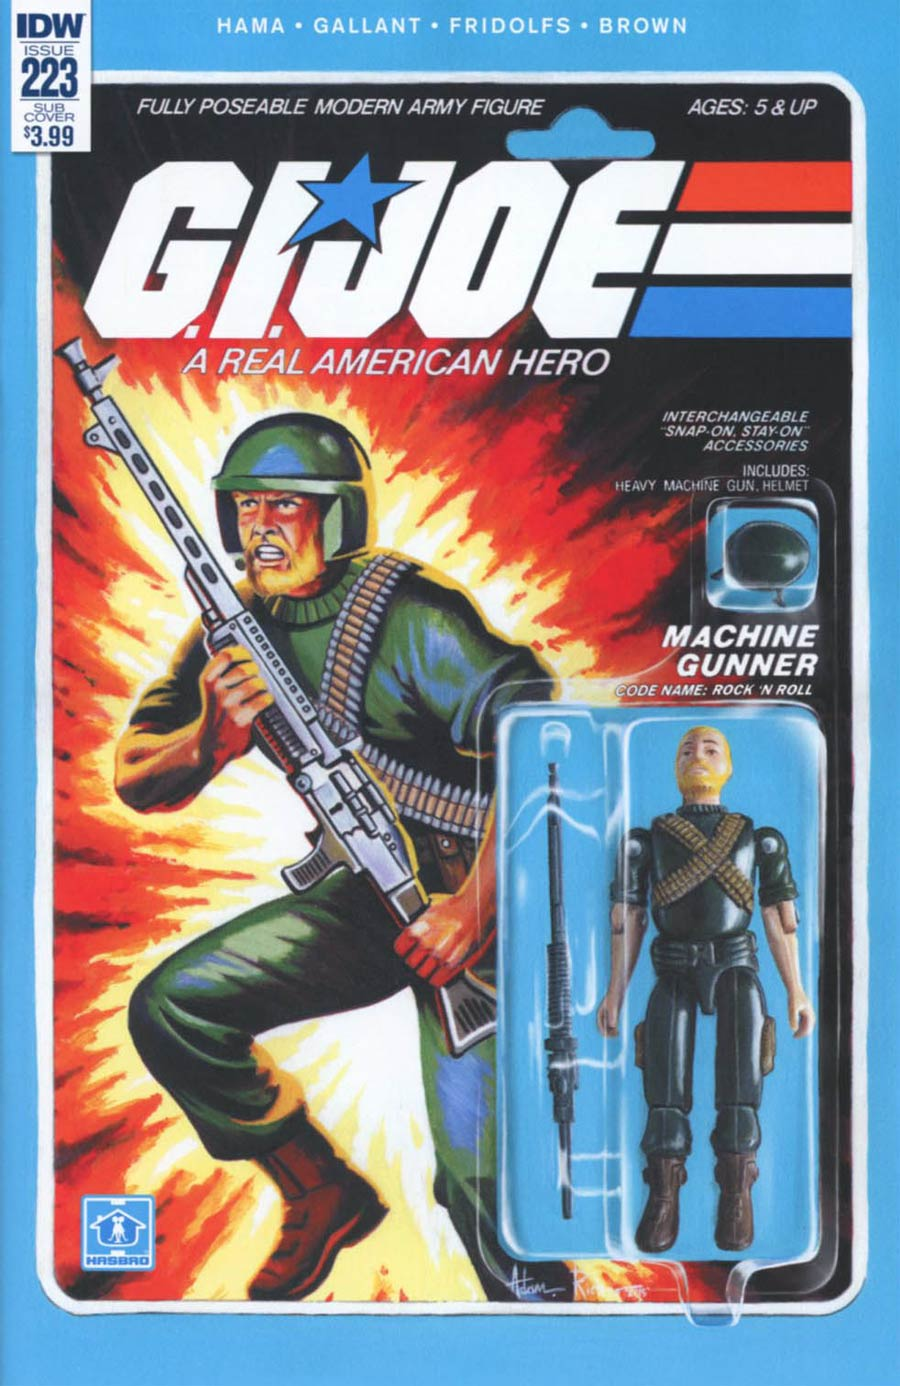 GI Joe A Real American Hero #223 Cover B Variant Adam Riches Subscription Cover